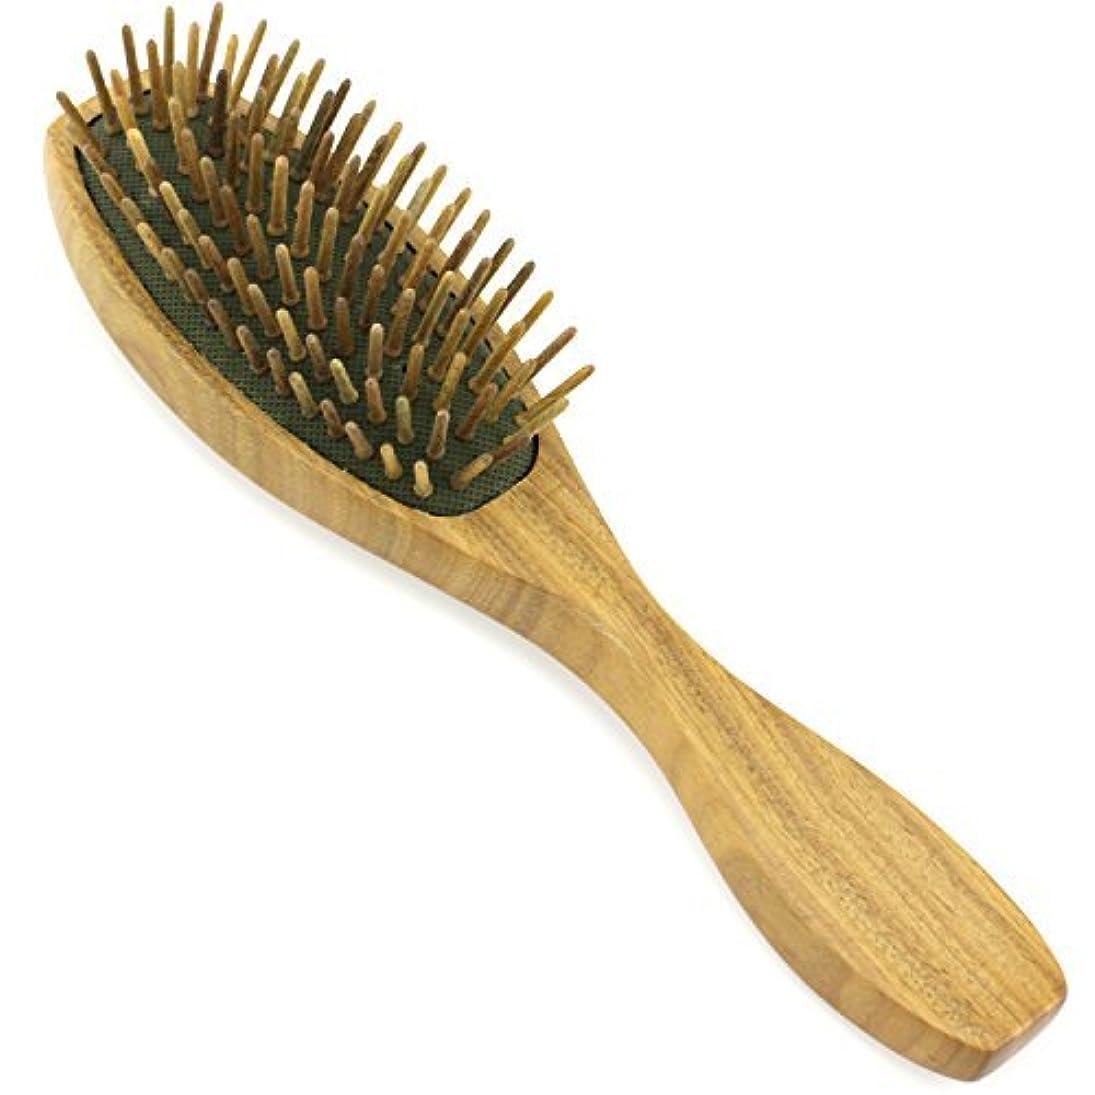 Evolatree - Evolatree - Wood Bristle Brush, Wood Comb Hair Comb, Wood, 8.25